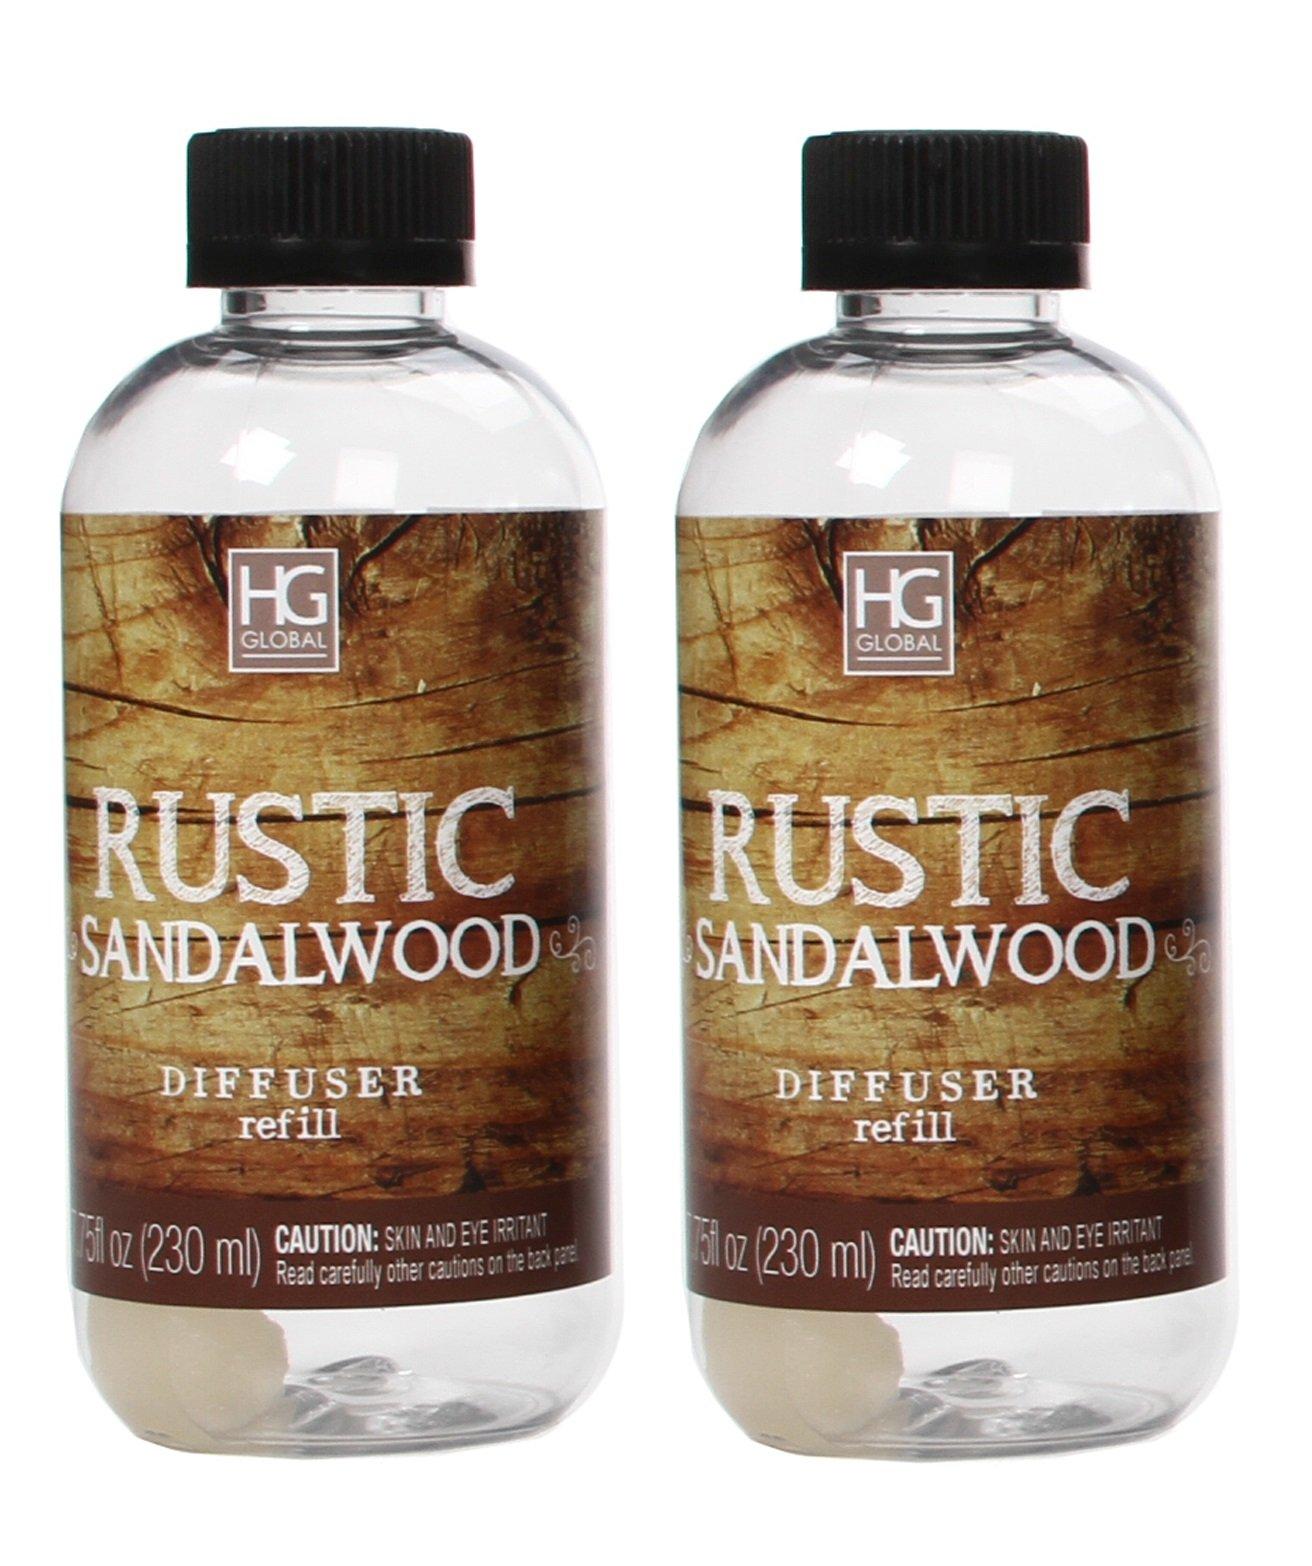 Hosley Set of 2 Premium Rustic Sandalwood Reed Diffuser Refills Oil, 230 ml (7.75 fl oz) Made in USA. Bulk Buy. Ideal Gift for Weddings, spa, Reiki, Meditation Settings O4